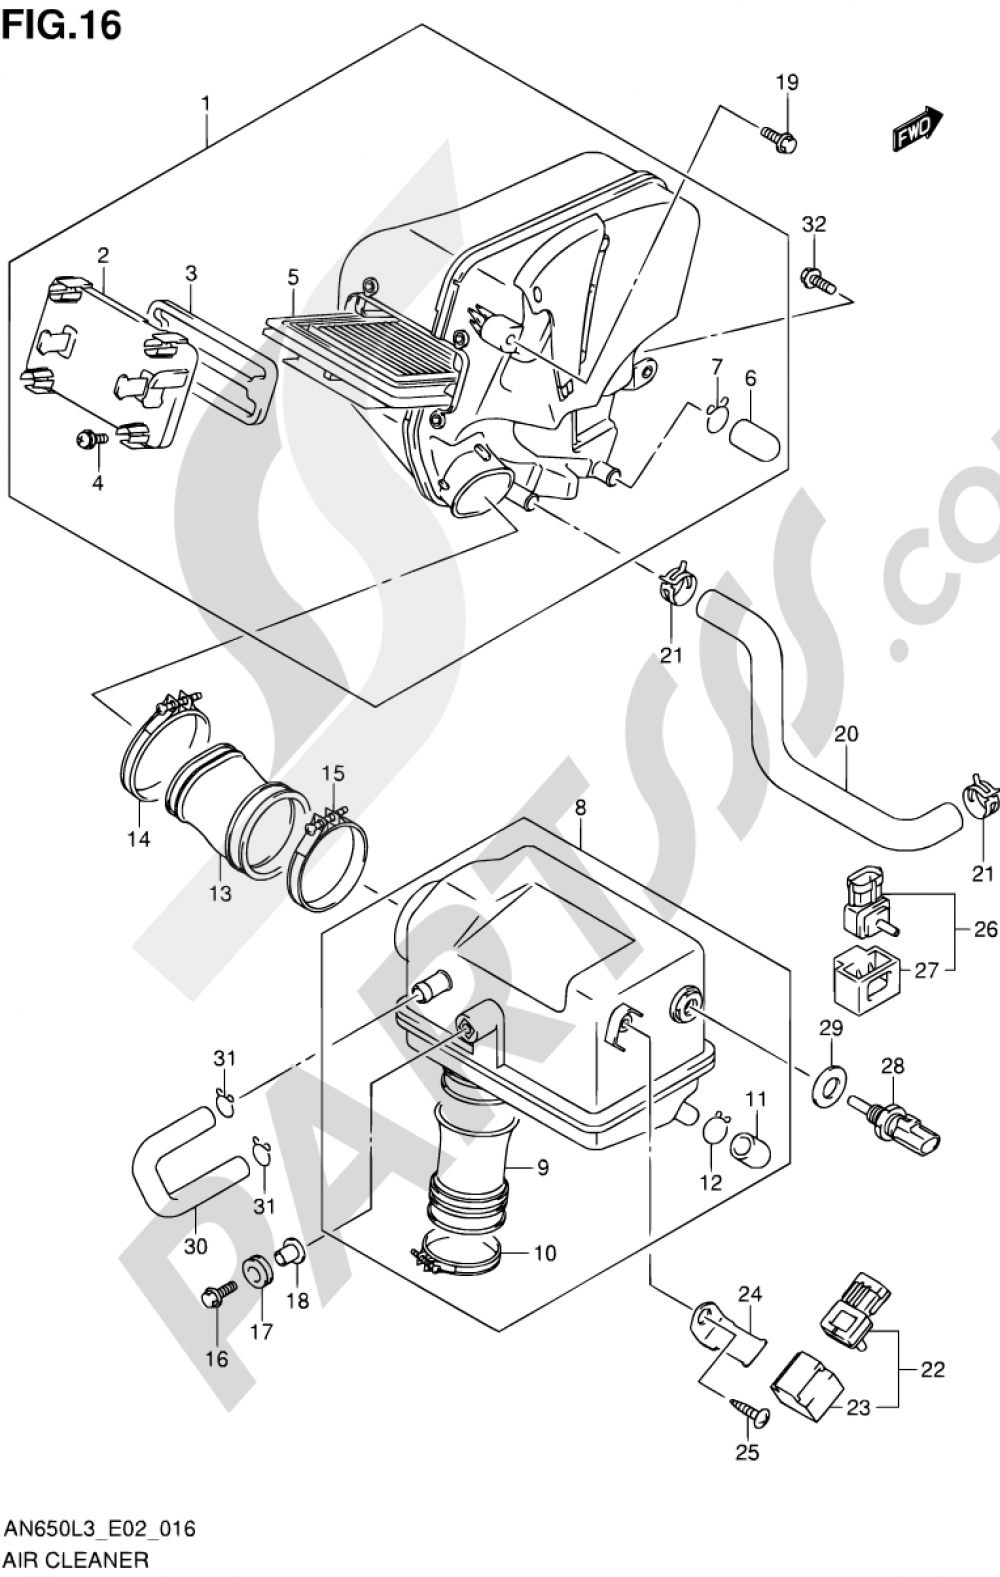 16 - AIR CLEANER (AN650ZL3 E19) Suzuki BURGMAN AN650Z 2013